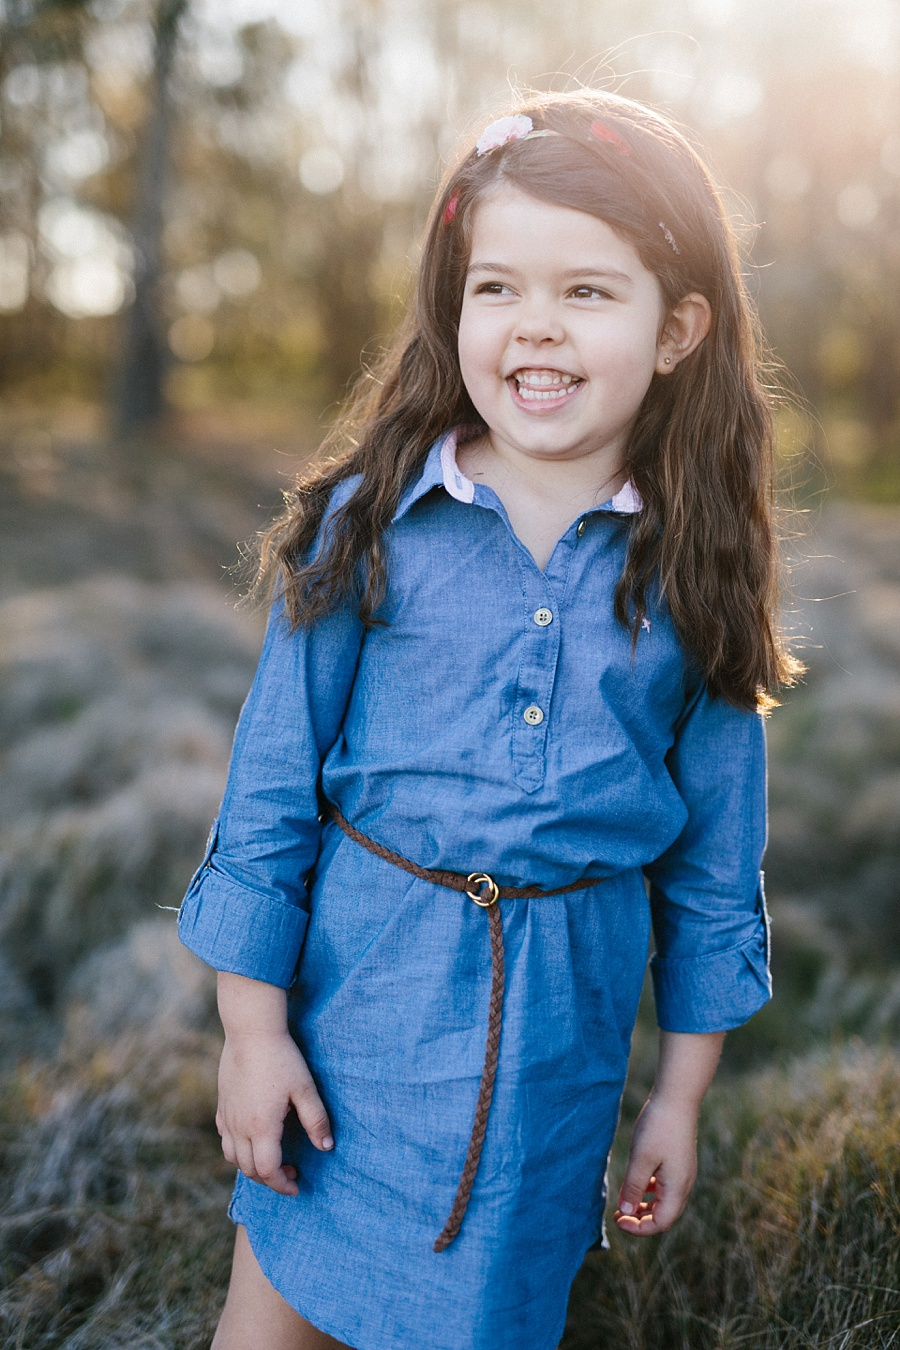 brisbane-kids-photography